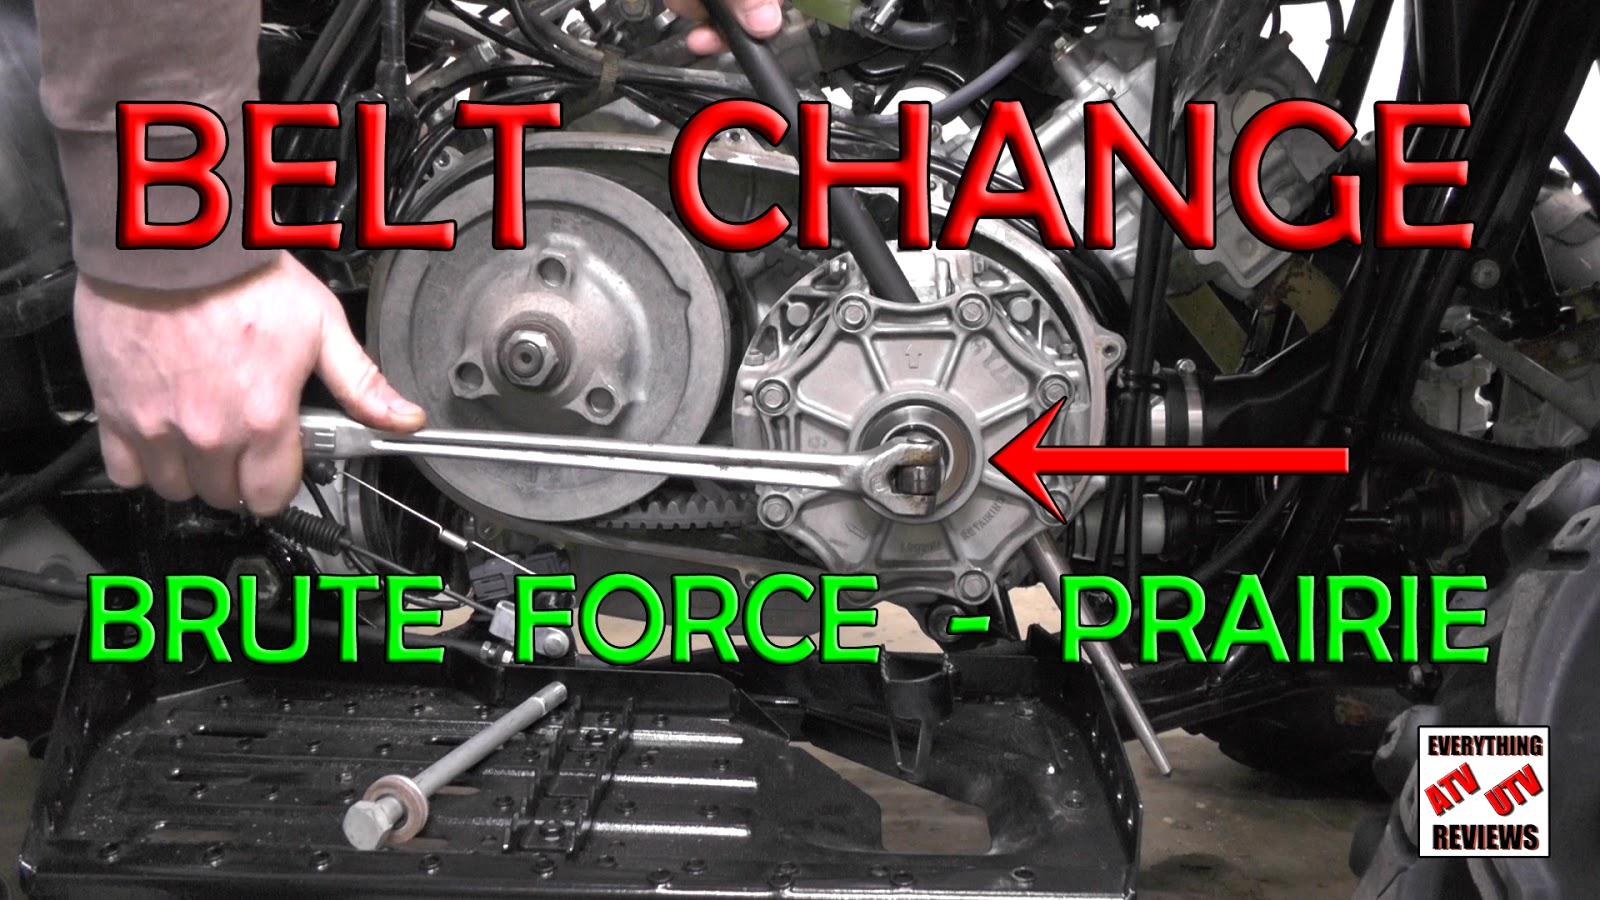 Everything Atv Utv Reviews How To Change Belt Kawasaki